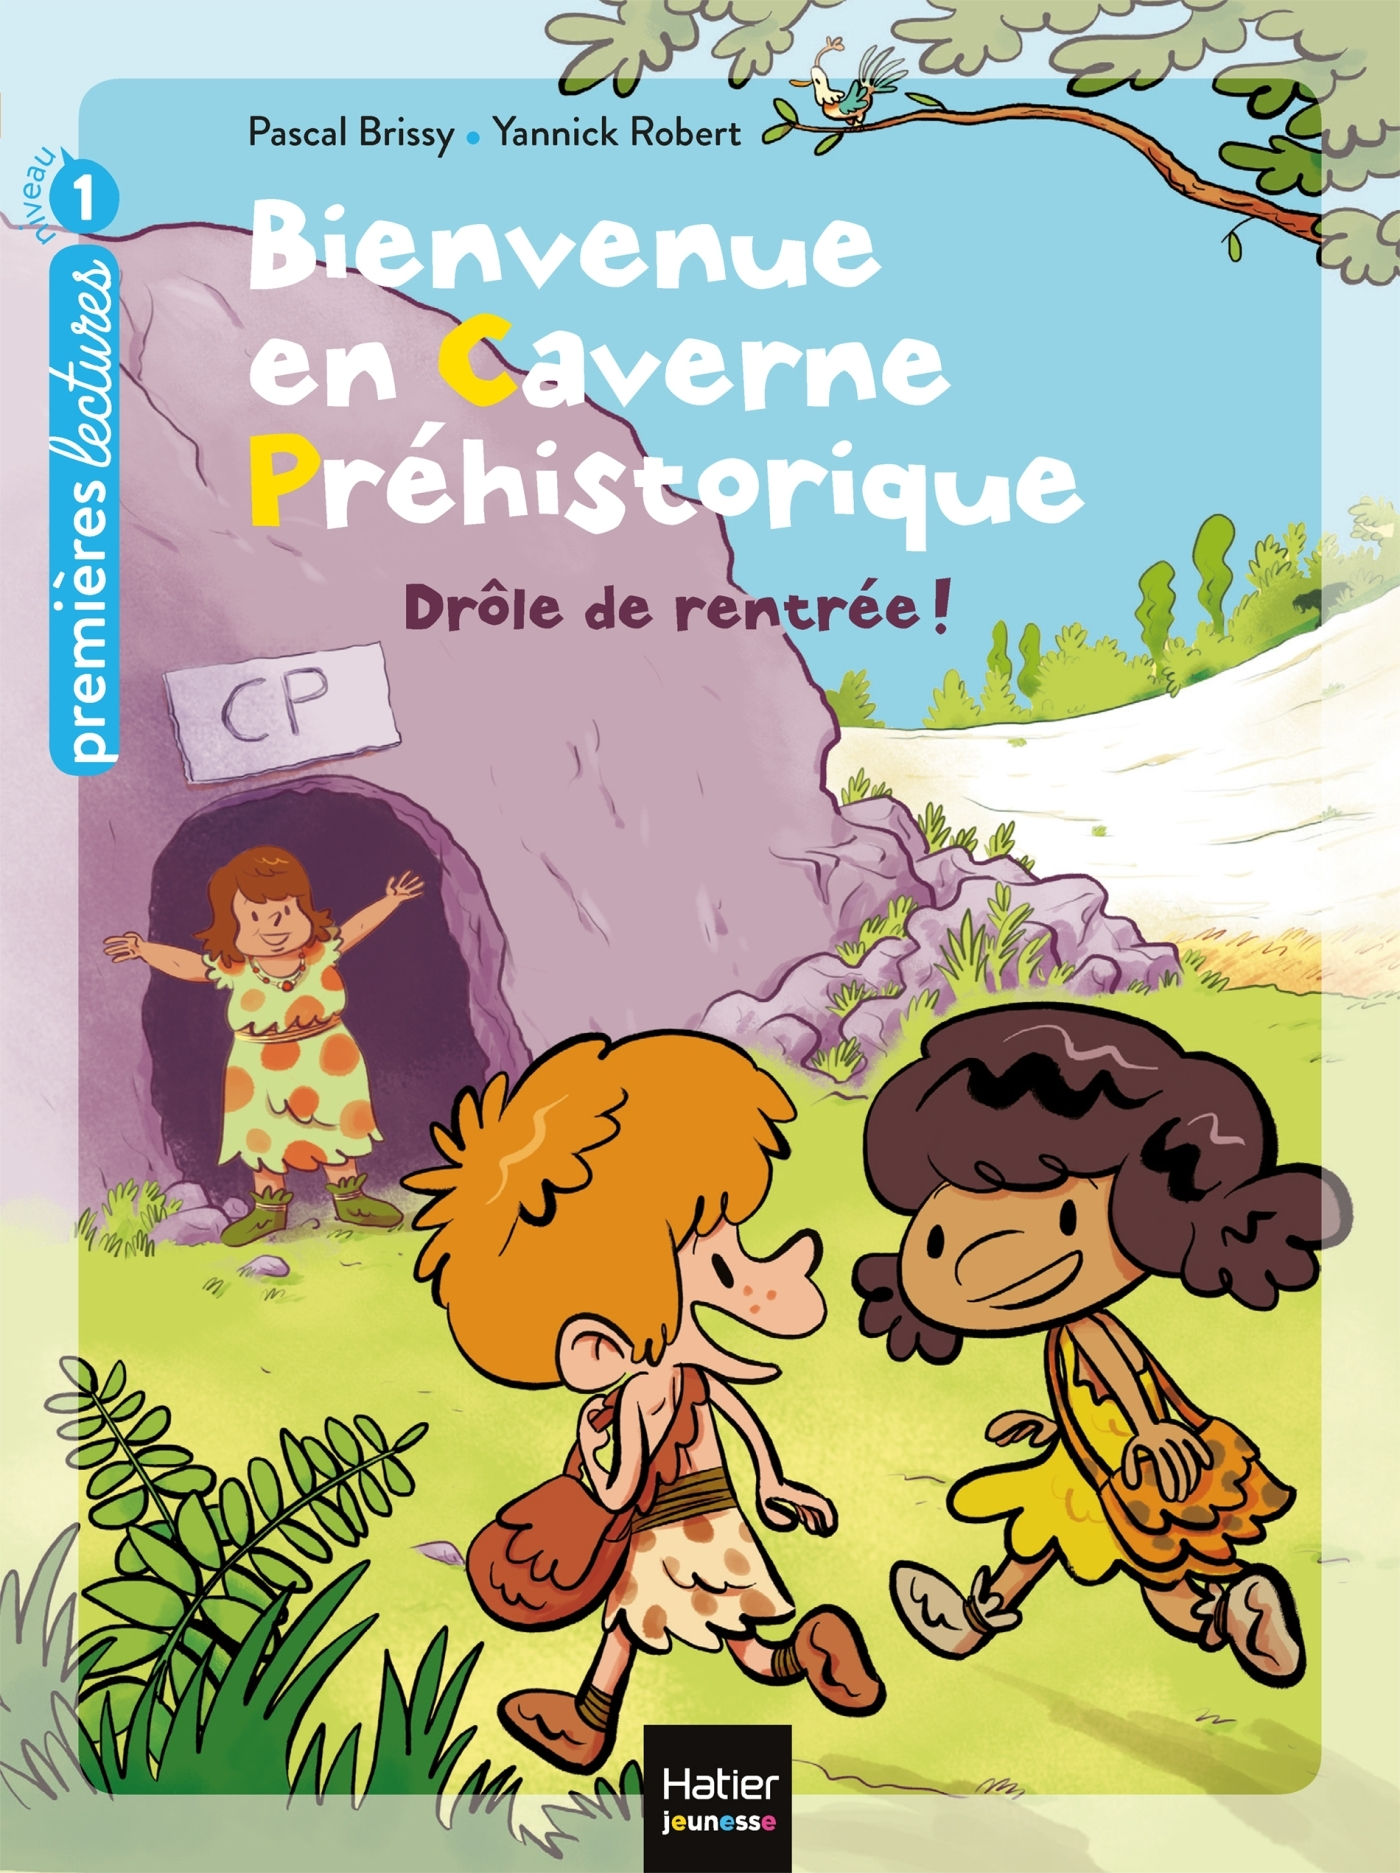 BIENVENUE EN CAVERNE PREHISTORIQUE - T01 - DROLE DE RENTREE !